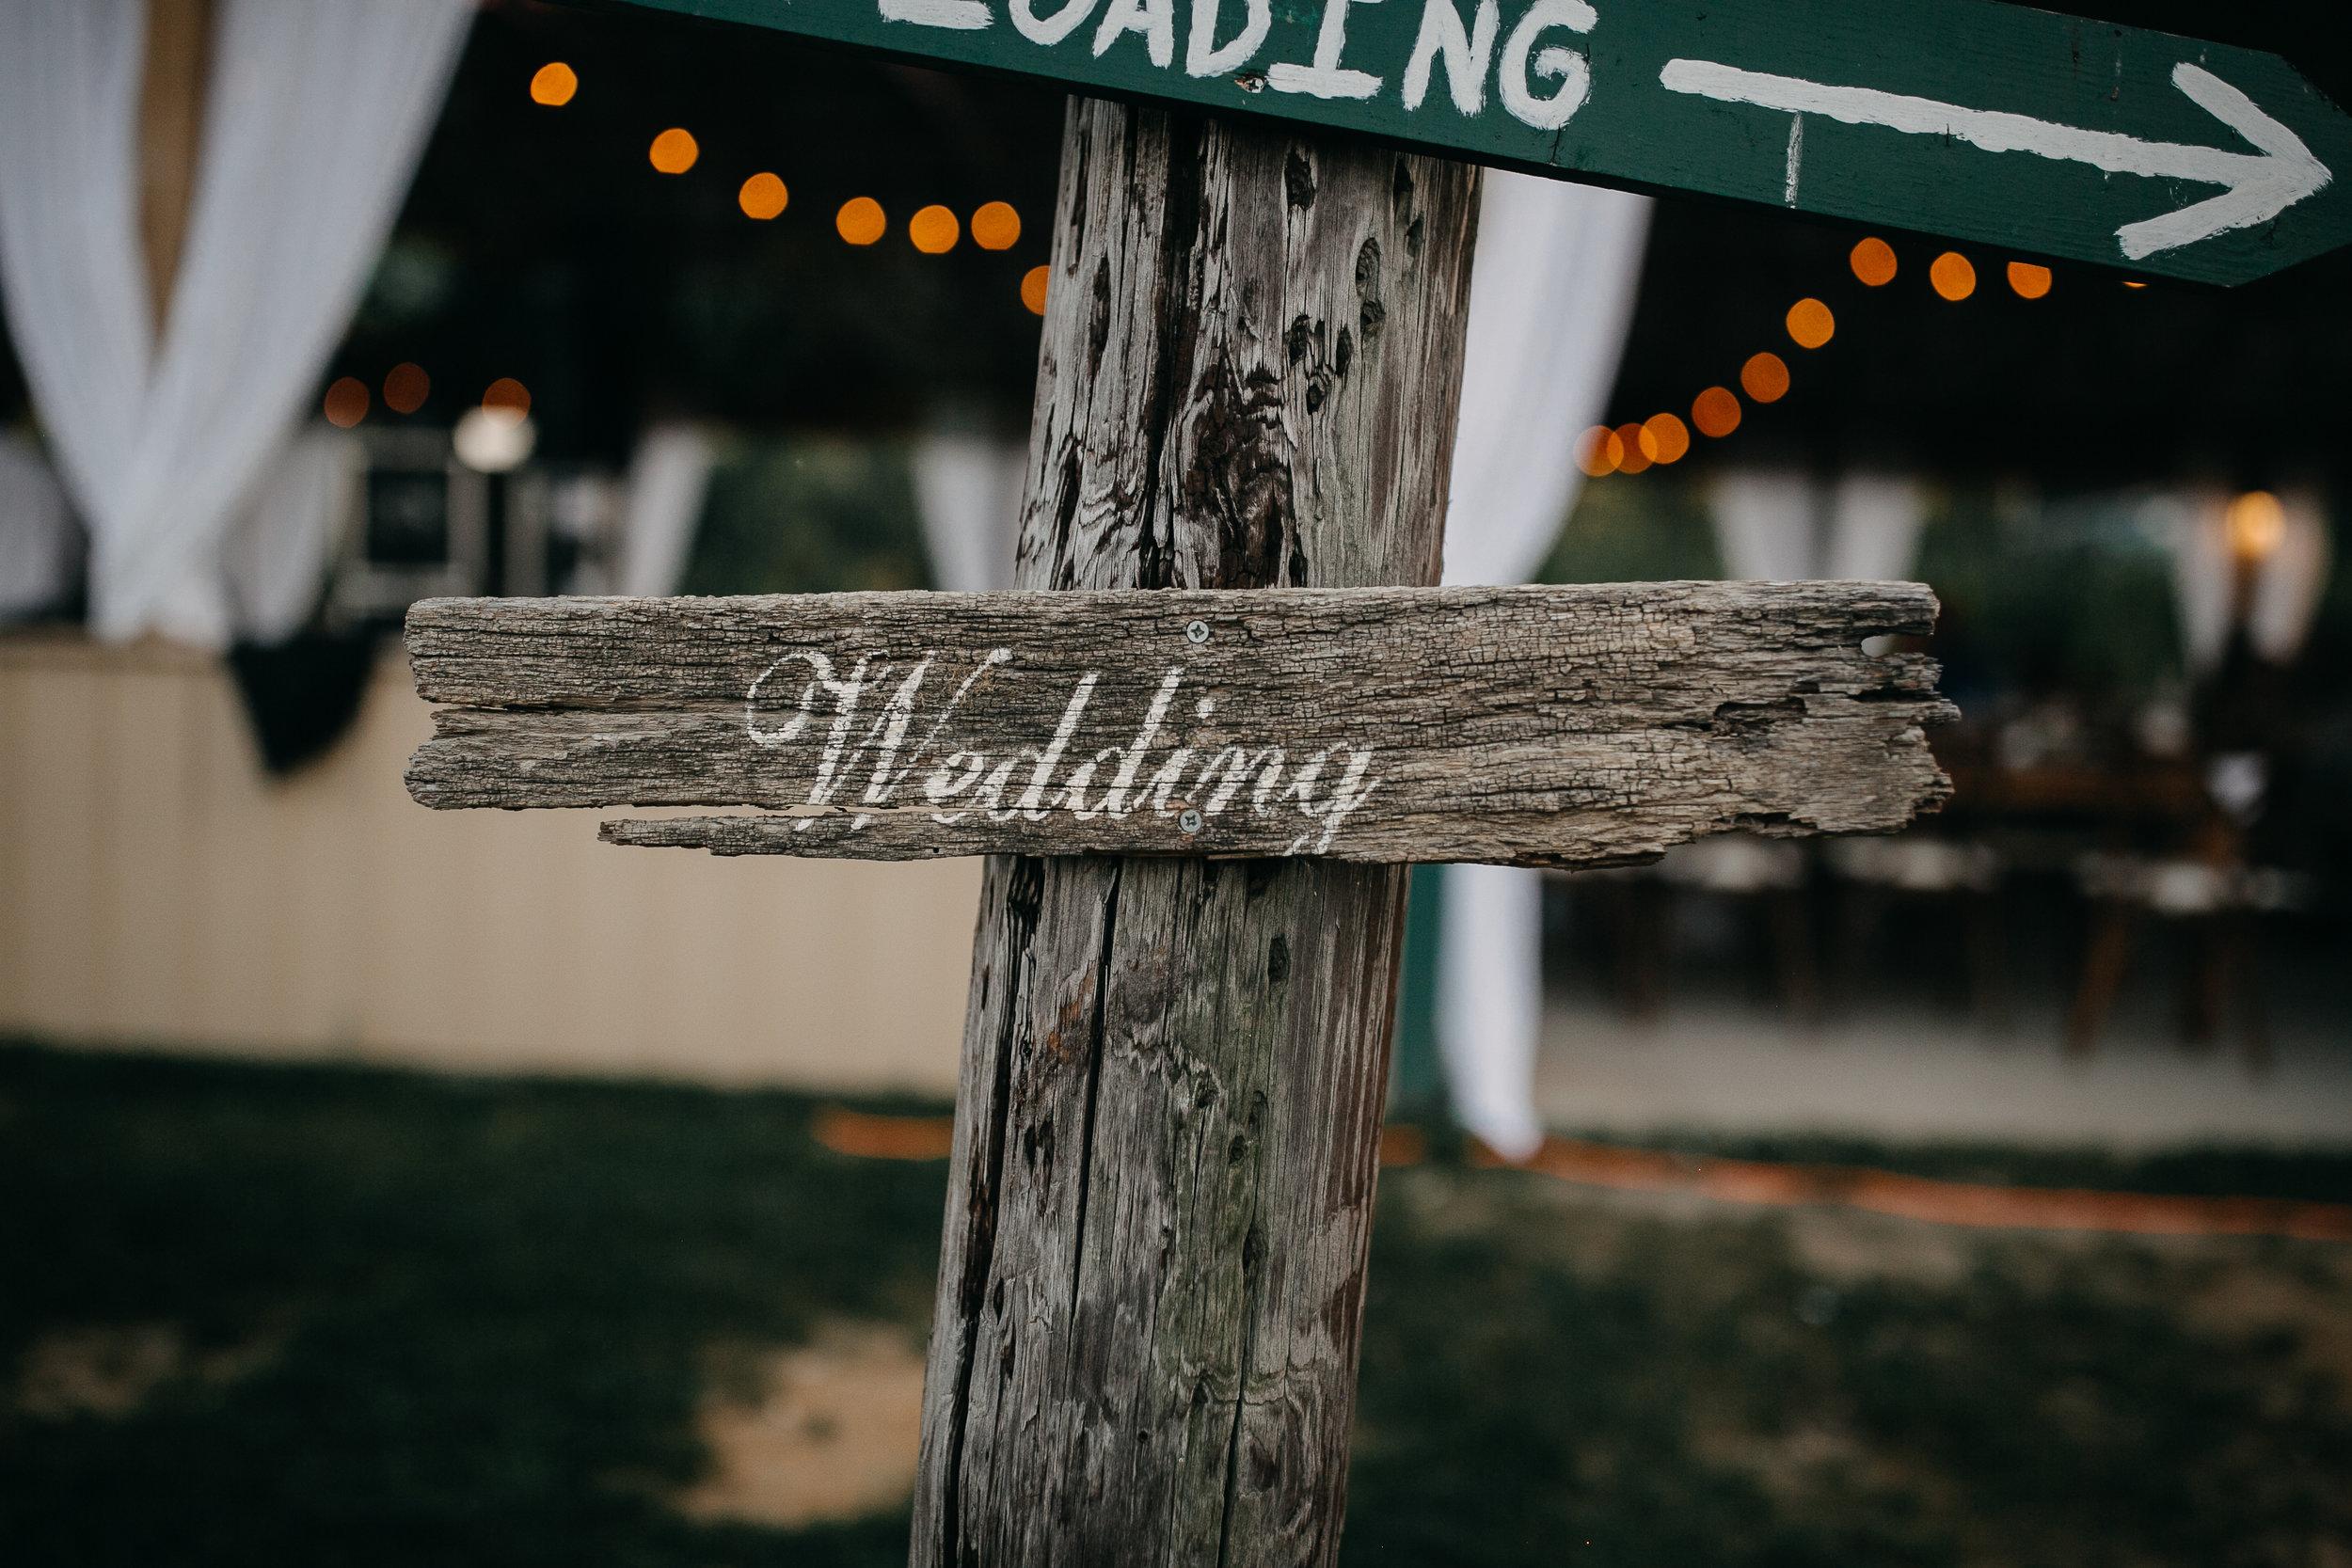 18 wedding sign.jpg